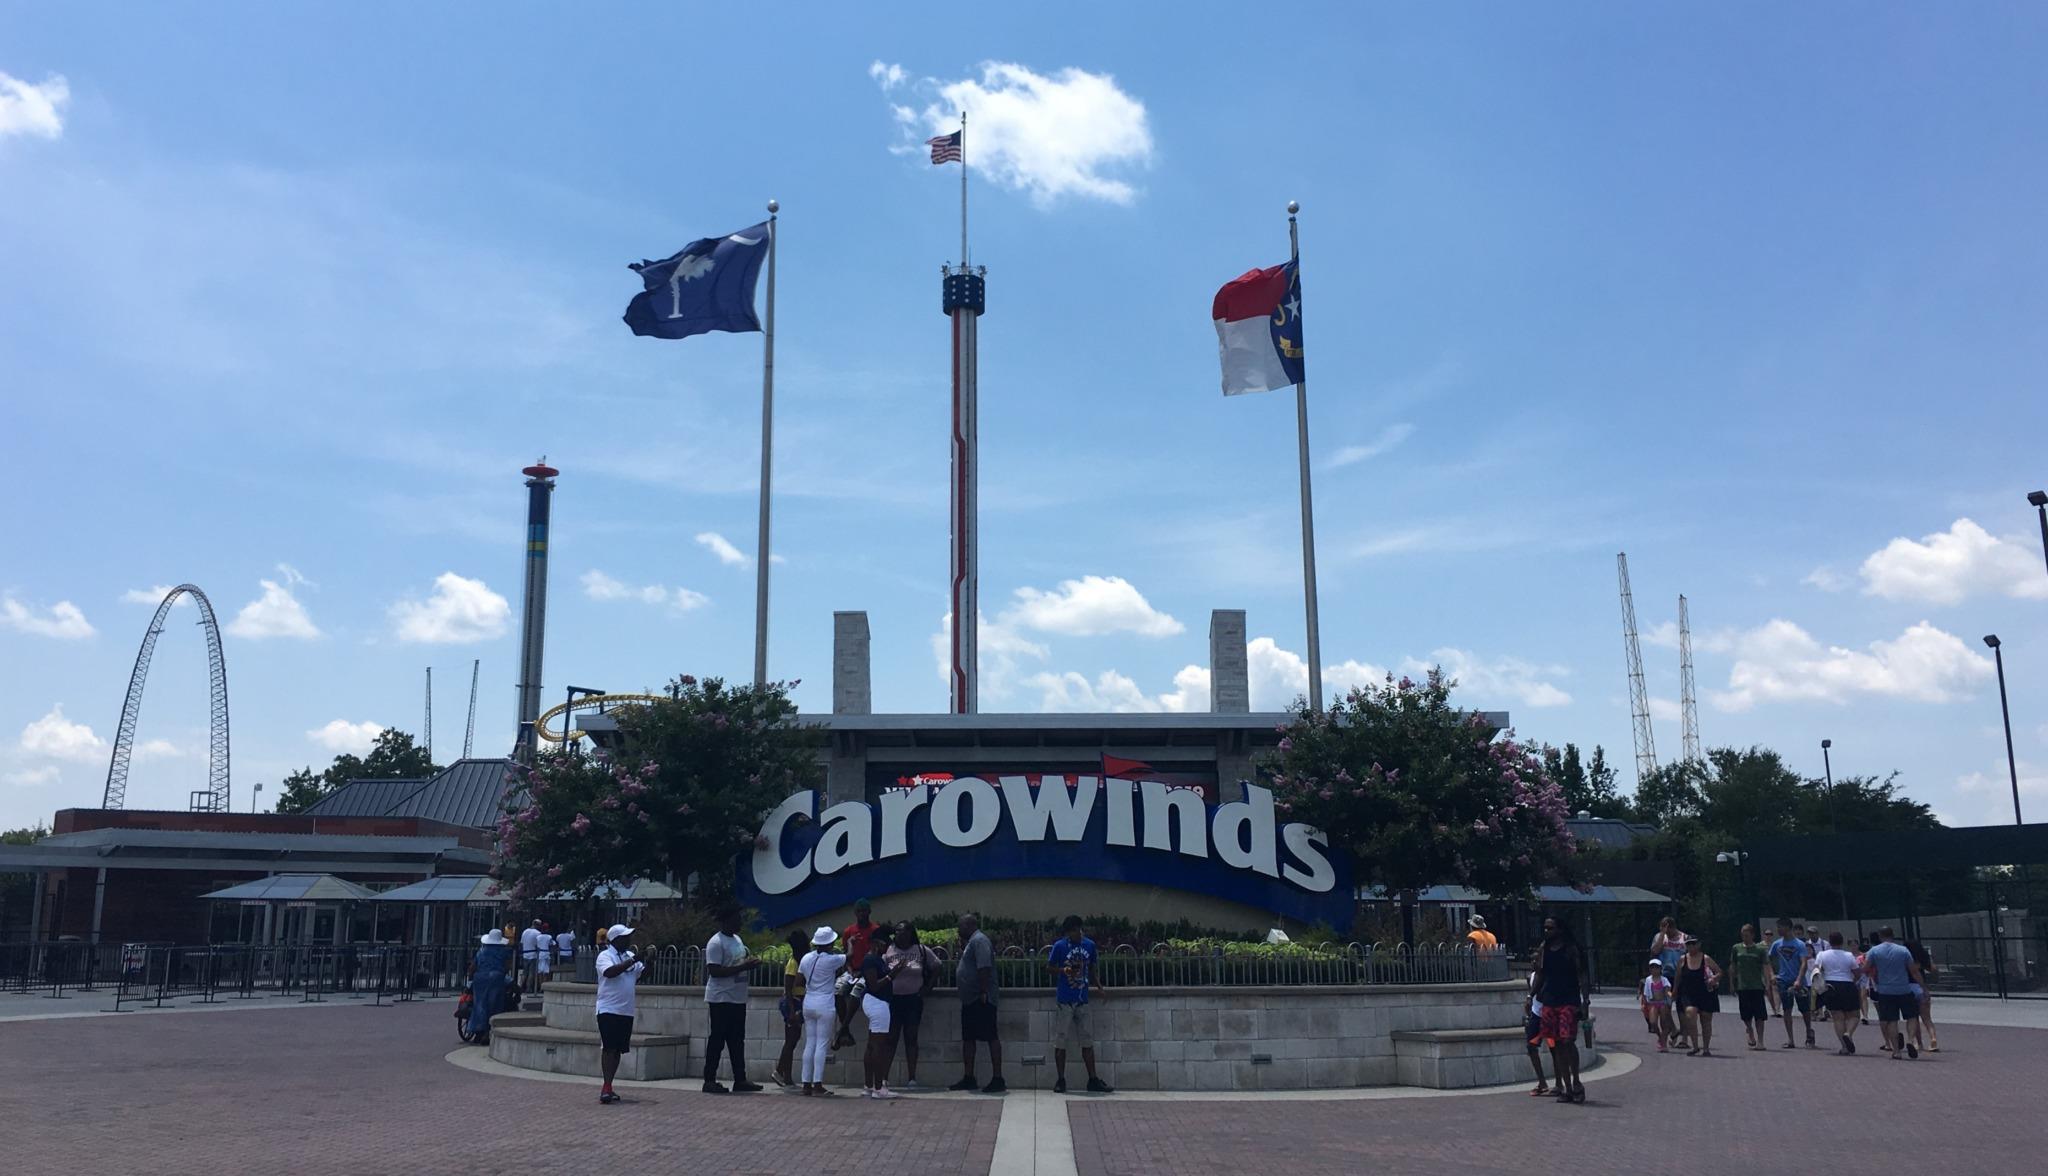 carowinds entrance